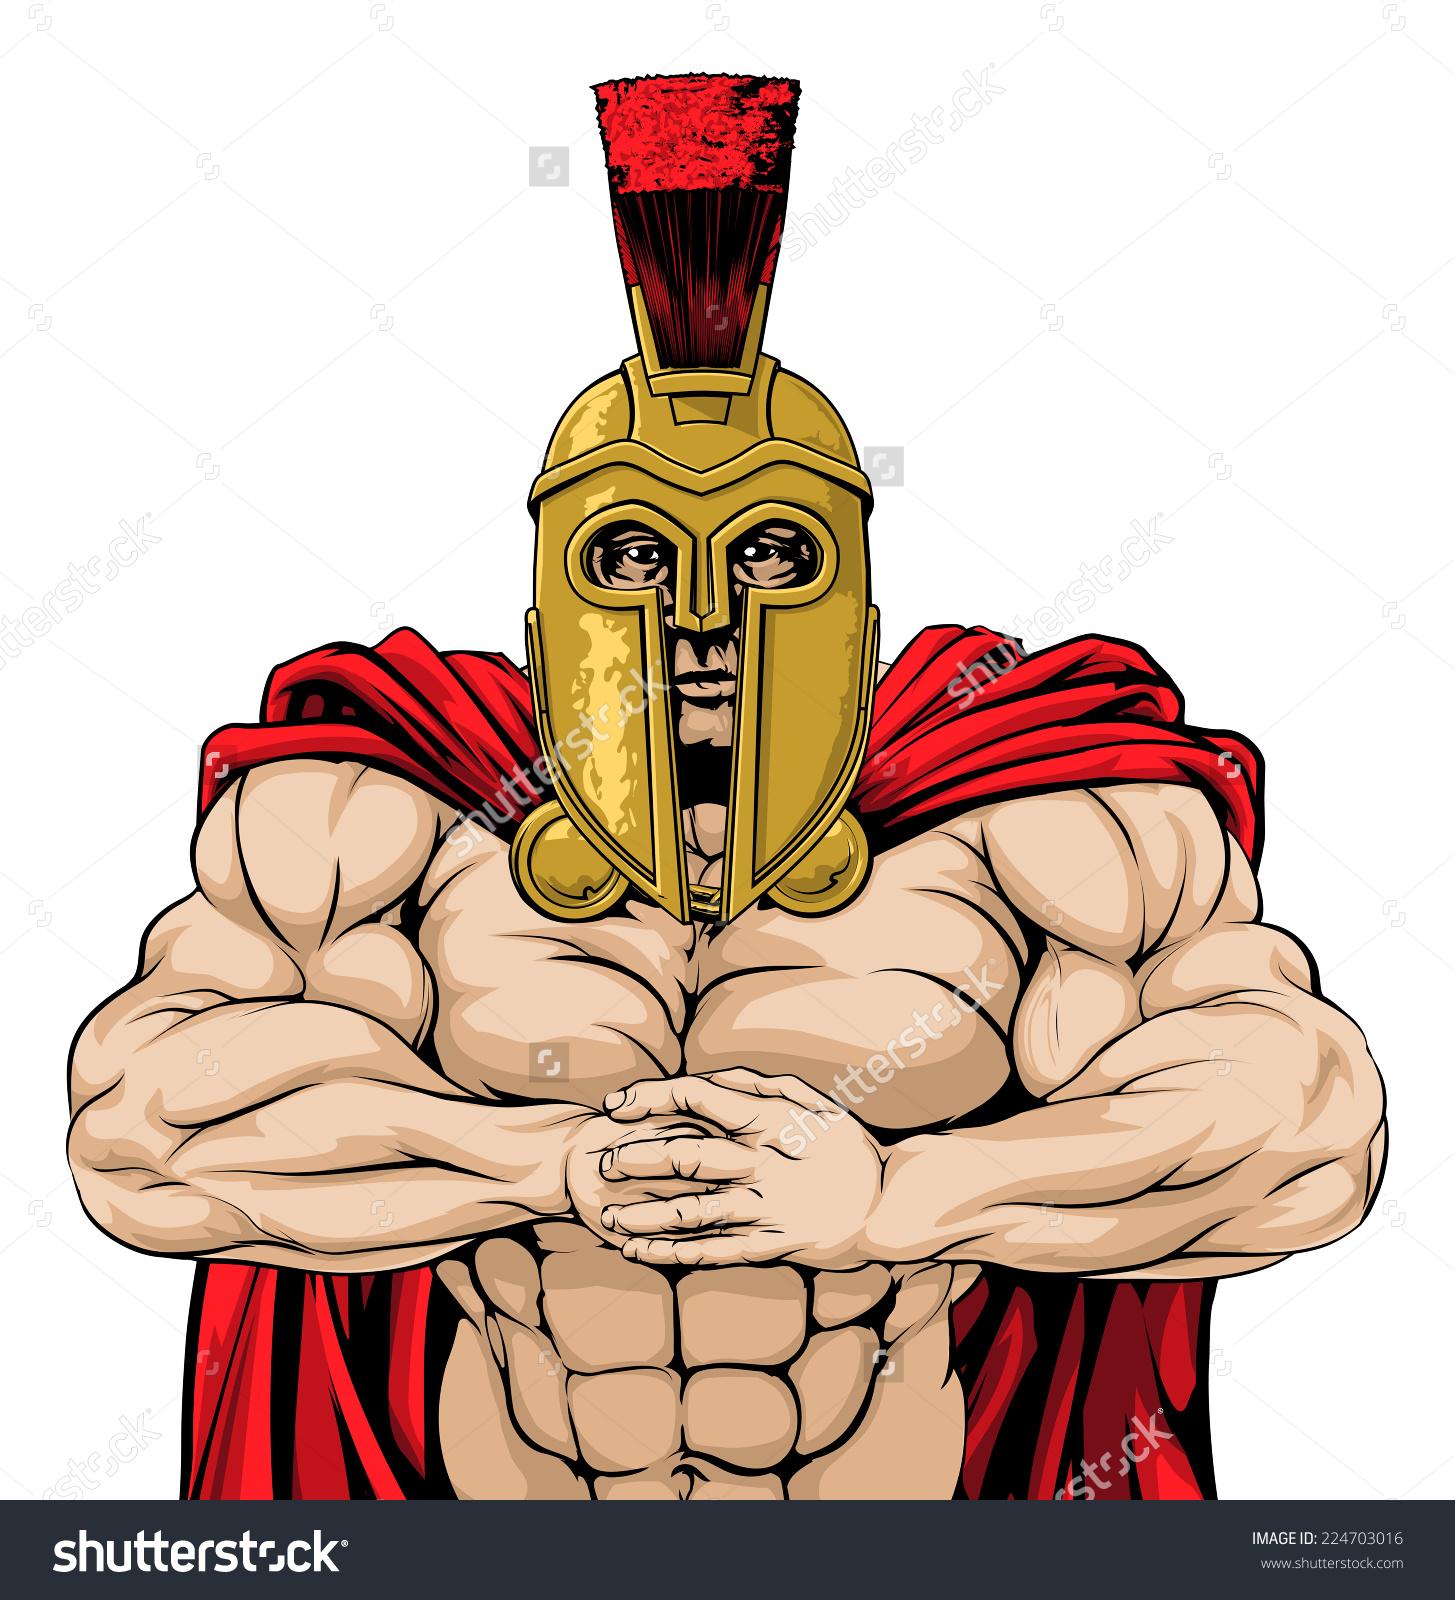 Mean Looking Spartan Man Ready Combat Stock Vector 224703016.